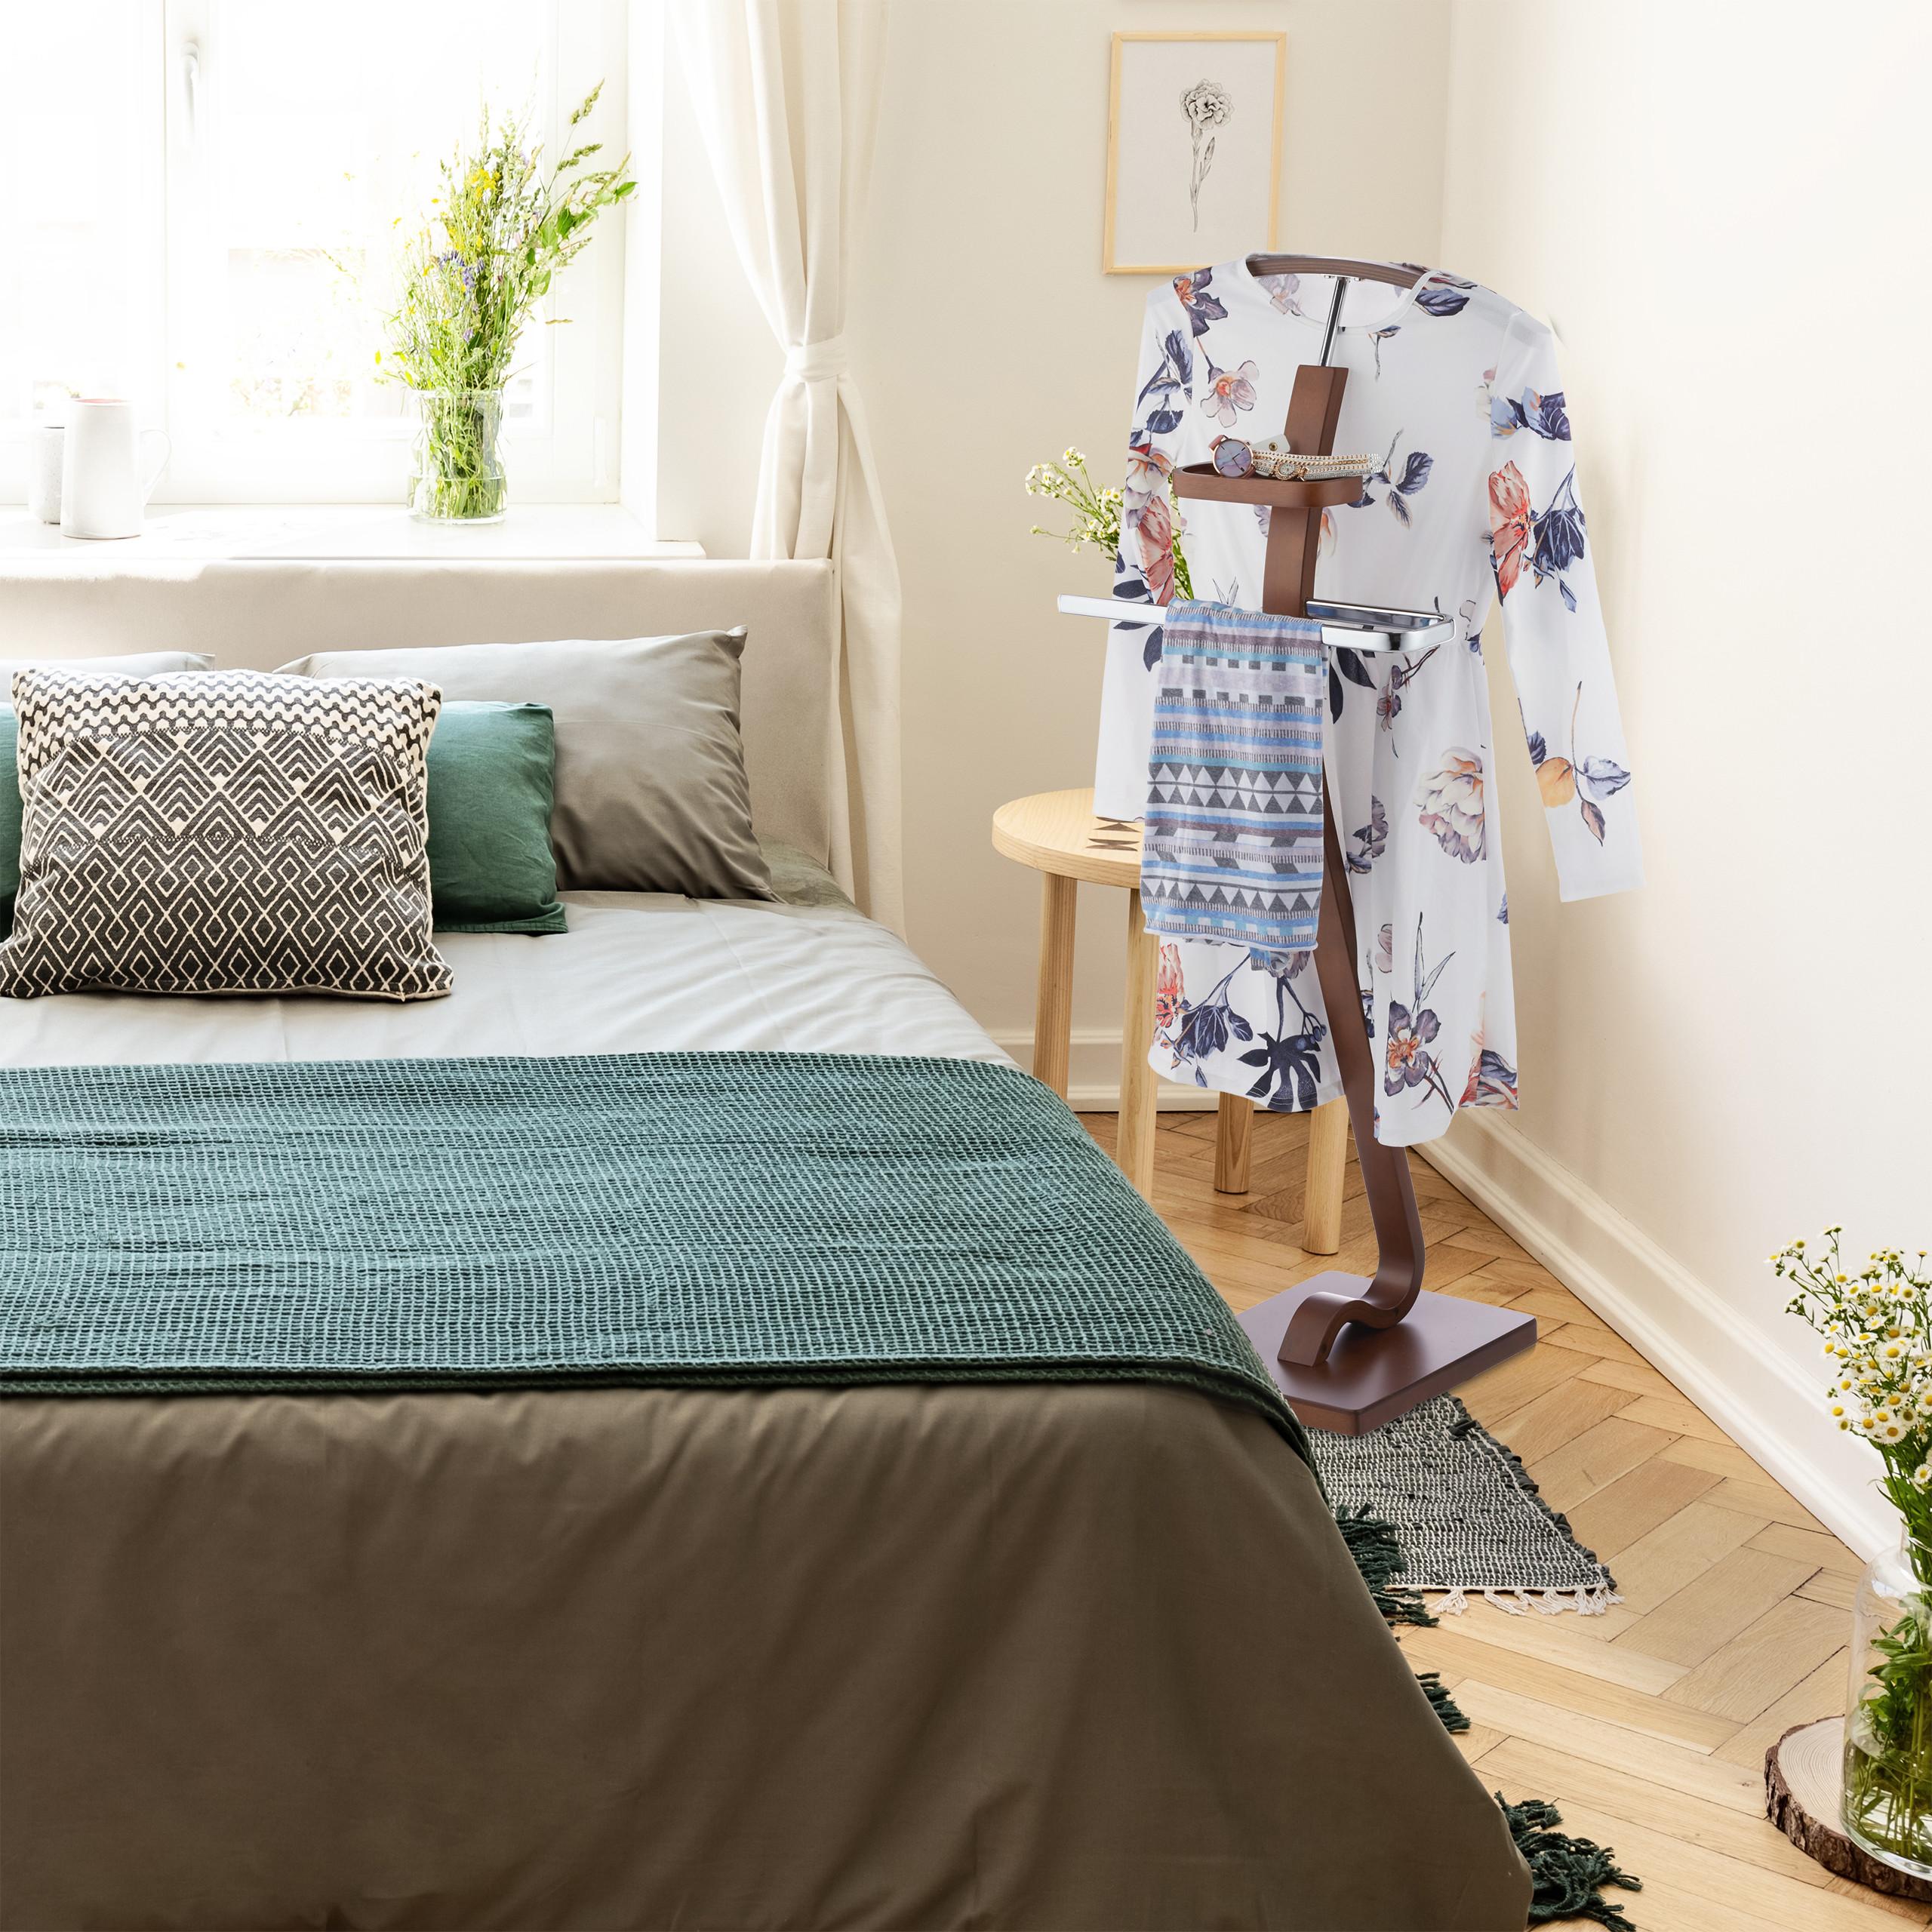 herrendiener wallnussoptik kleiderbutler stummer diener holz metall damendiener ebay. Black Bedroom Furniture Sets. Home Design Ideas